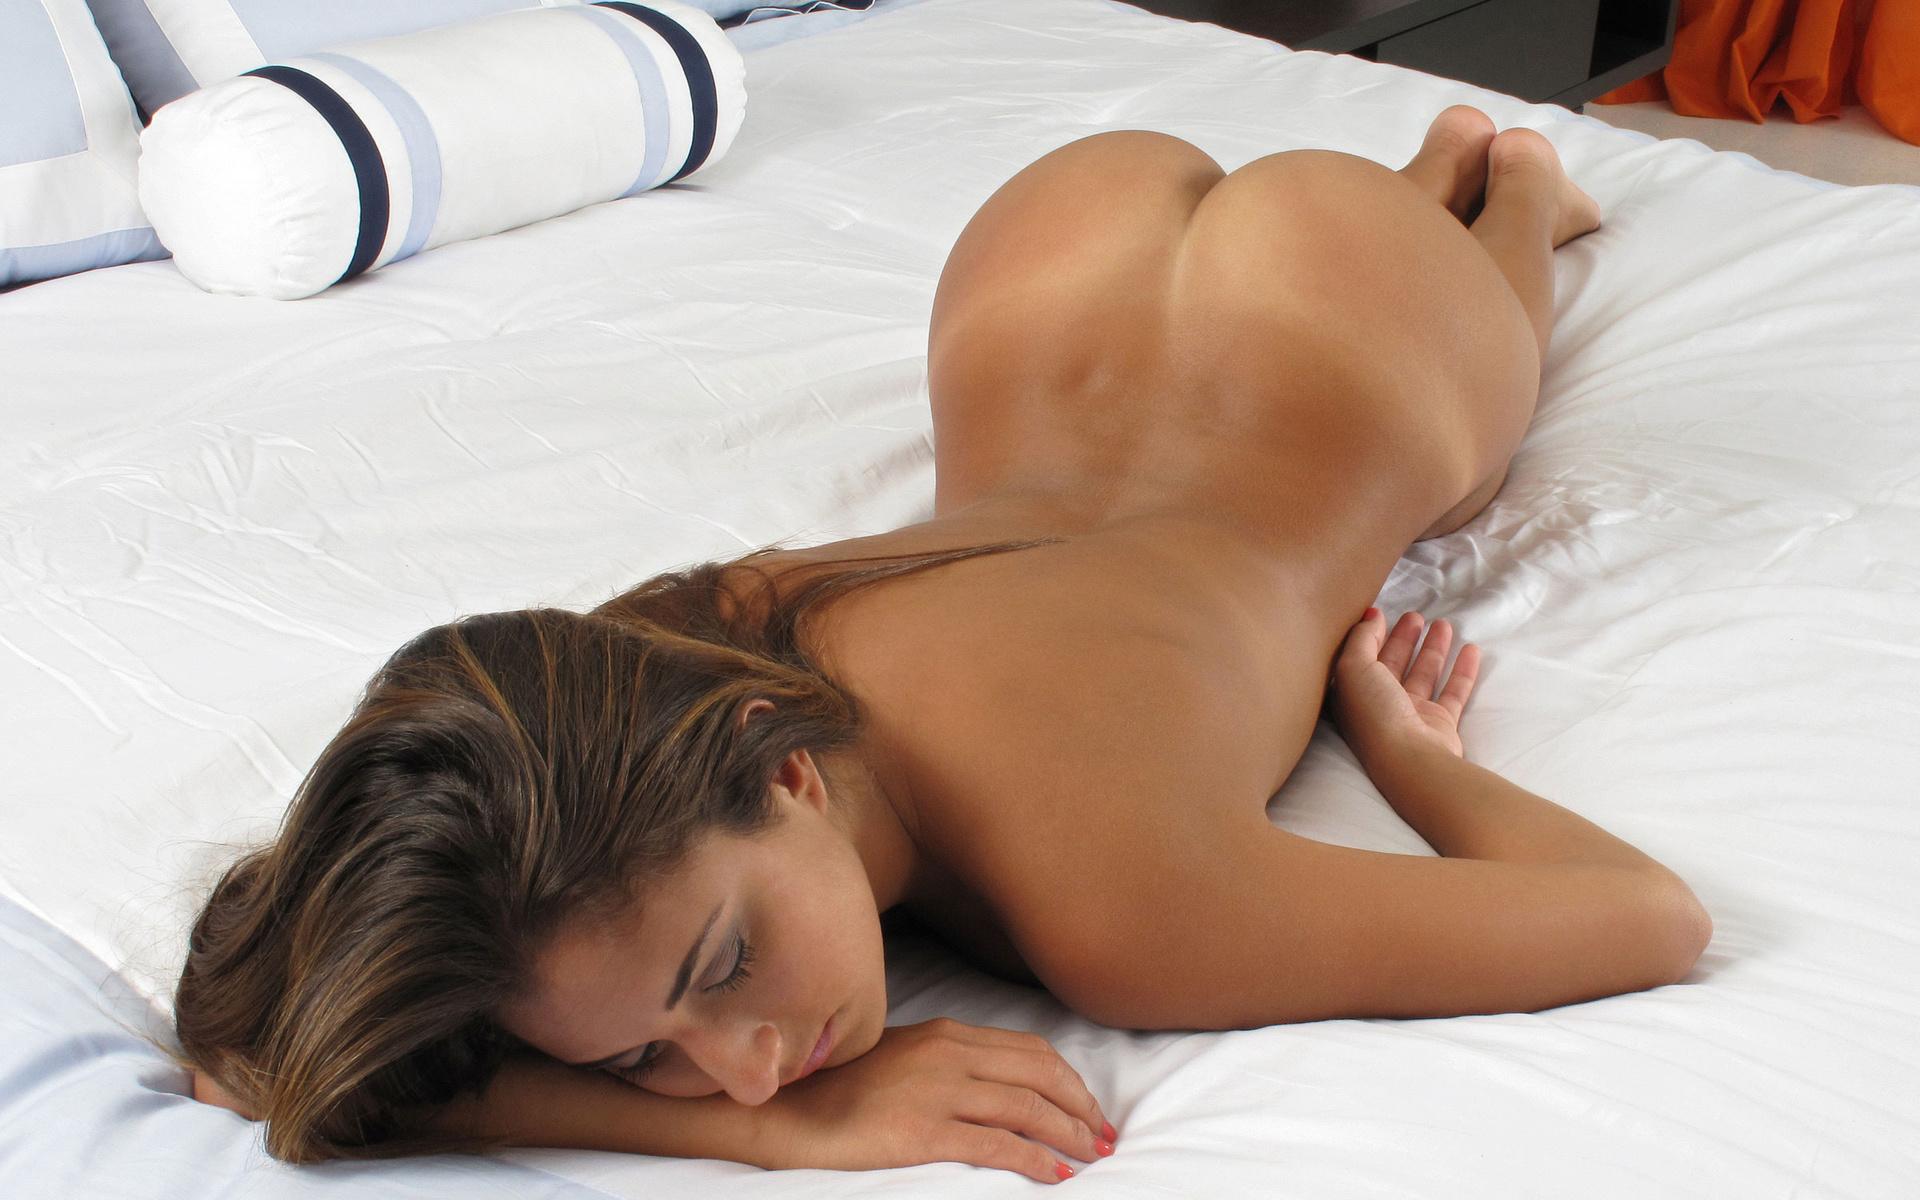 Голые Попки На Кровати Фото